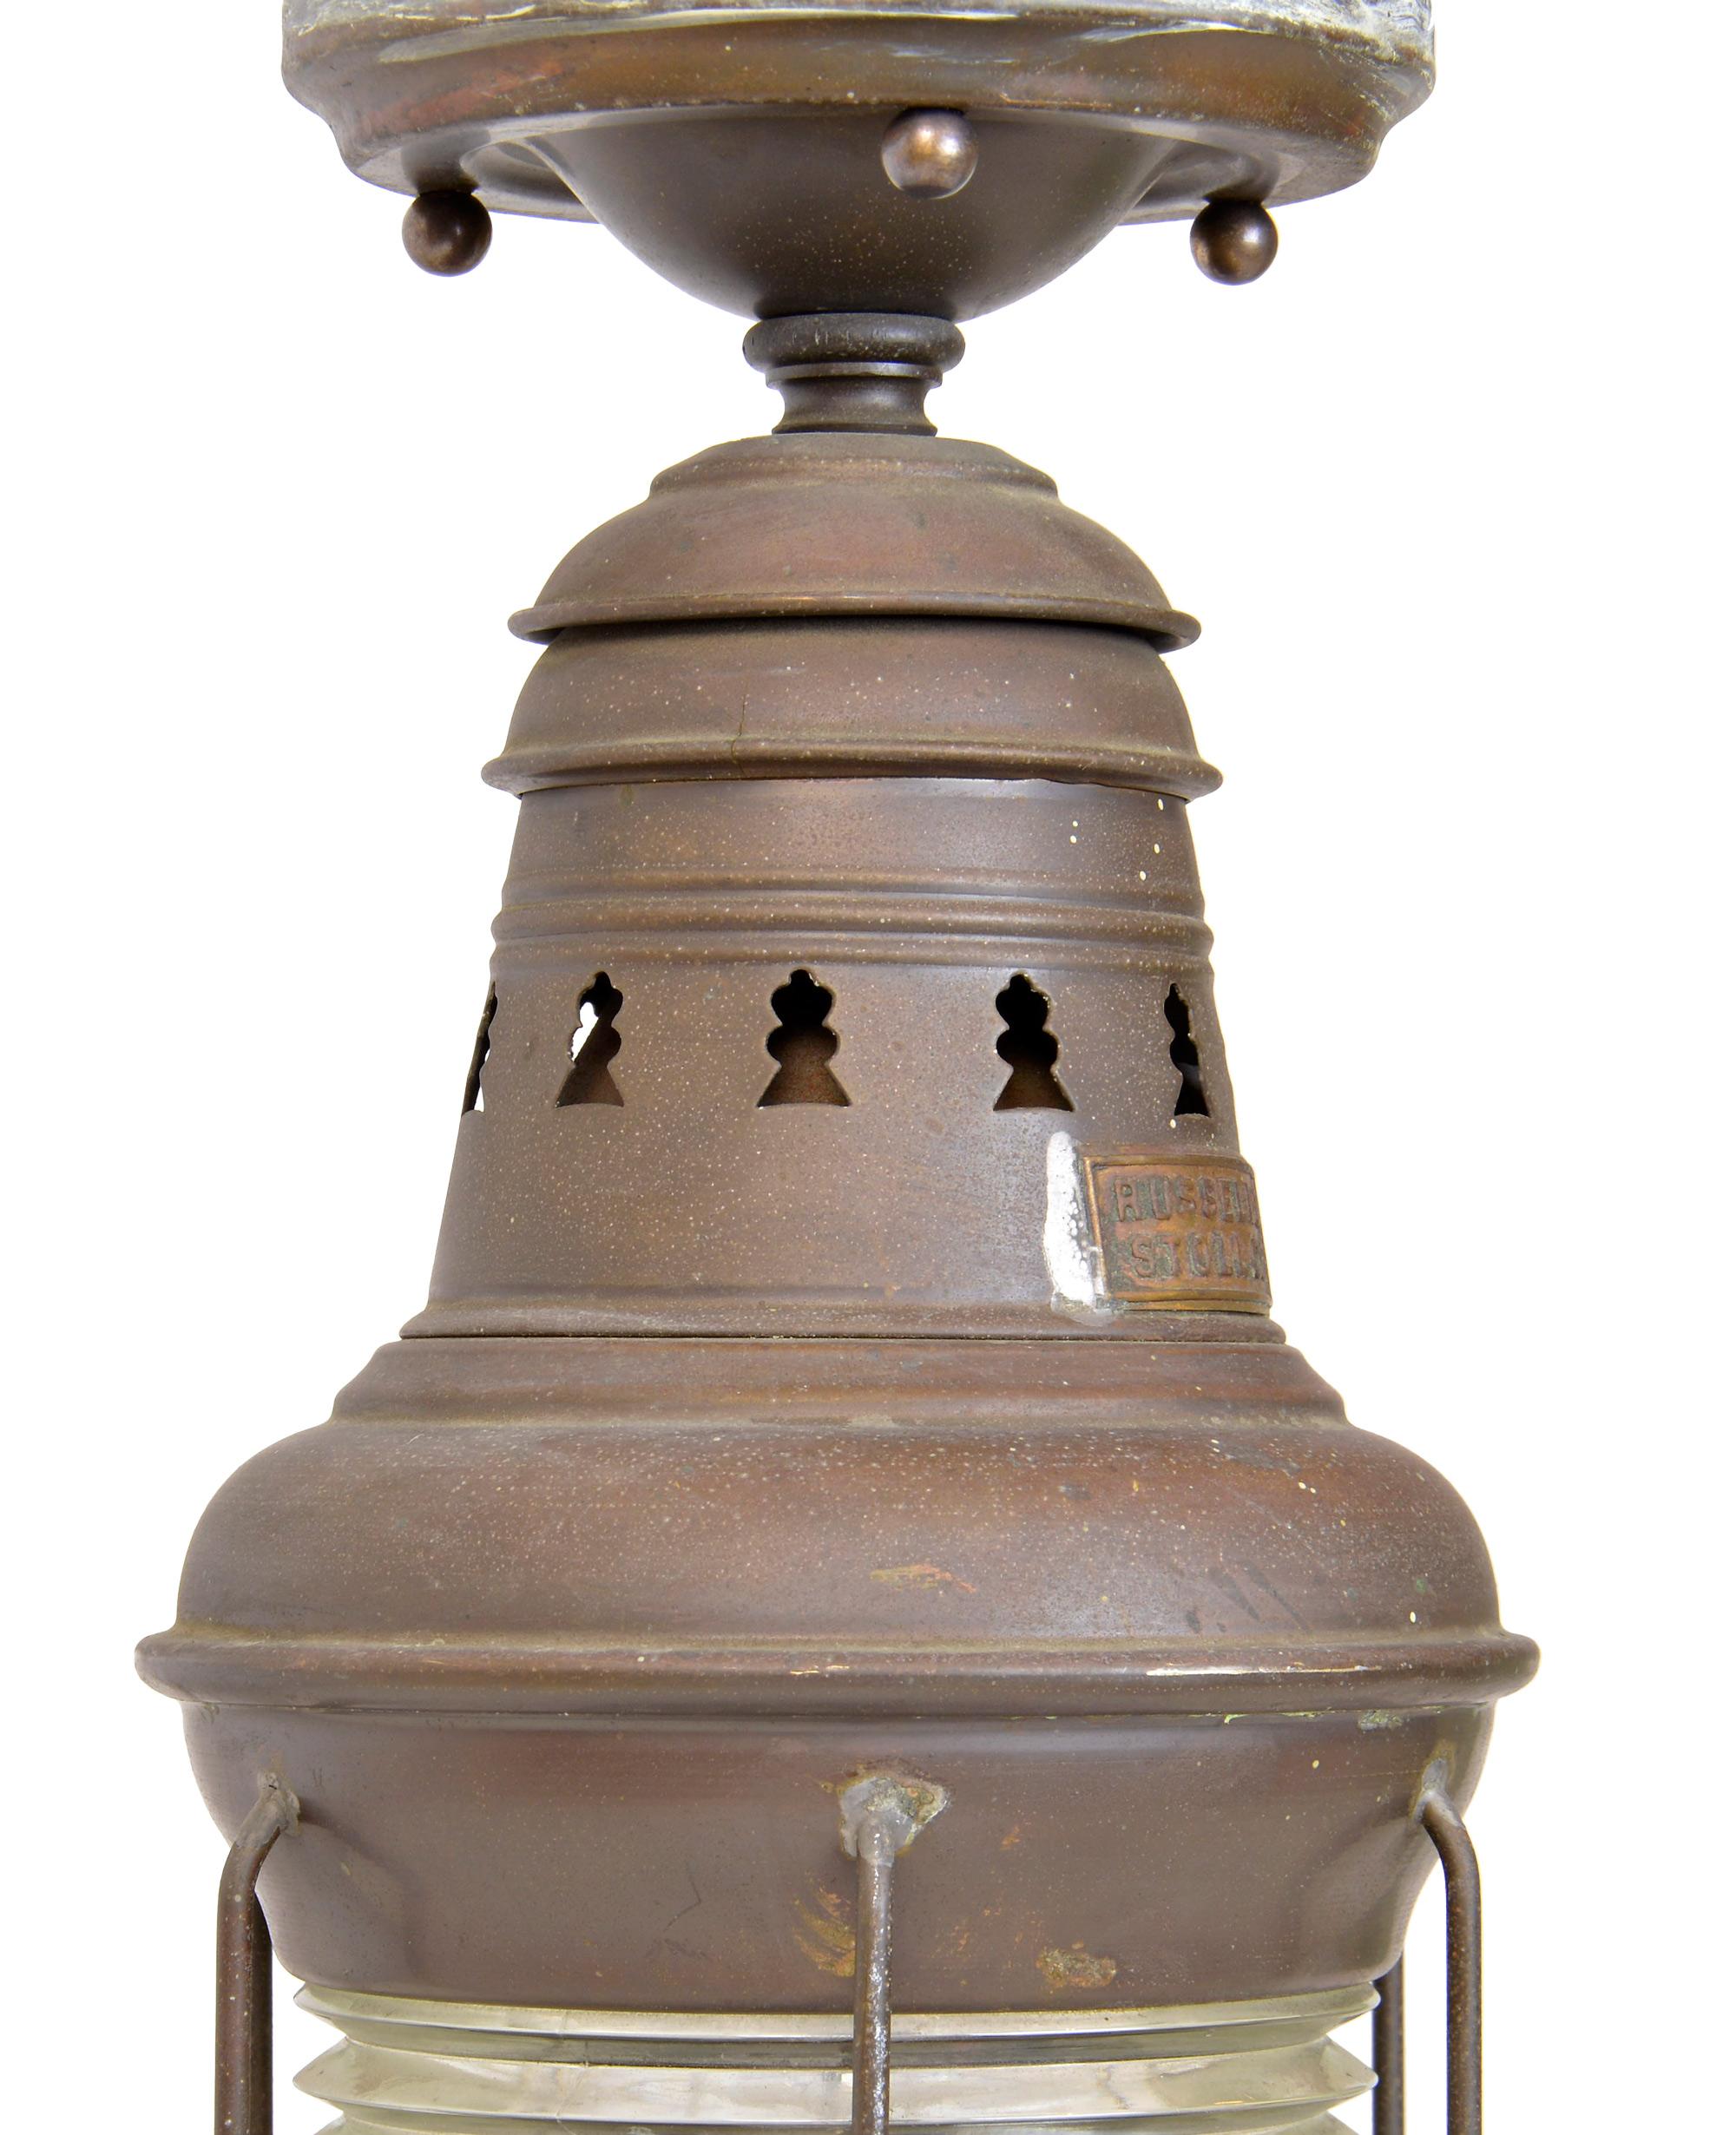 46522-russel-and-stoll-marine-light-top.jpg